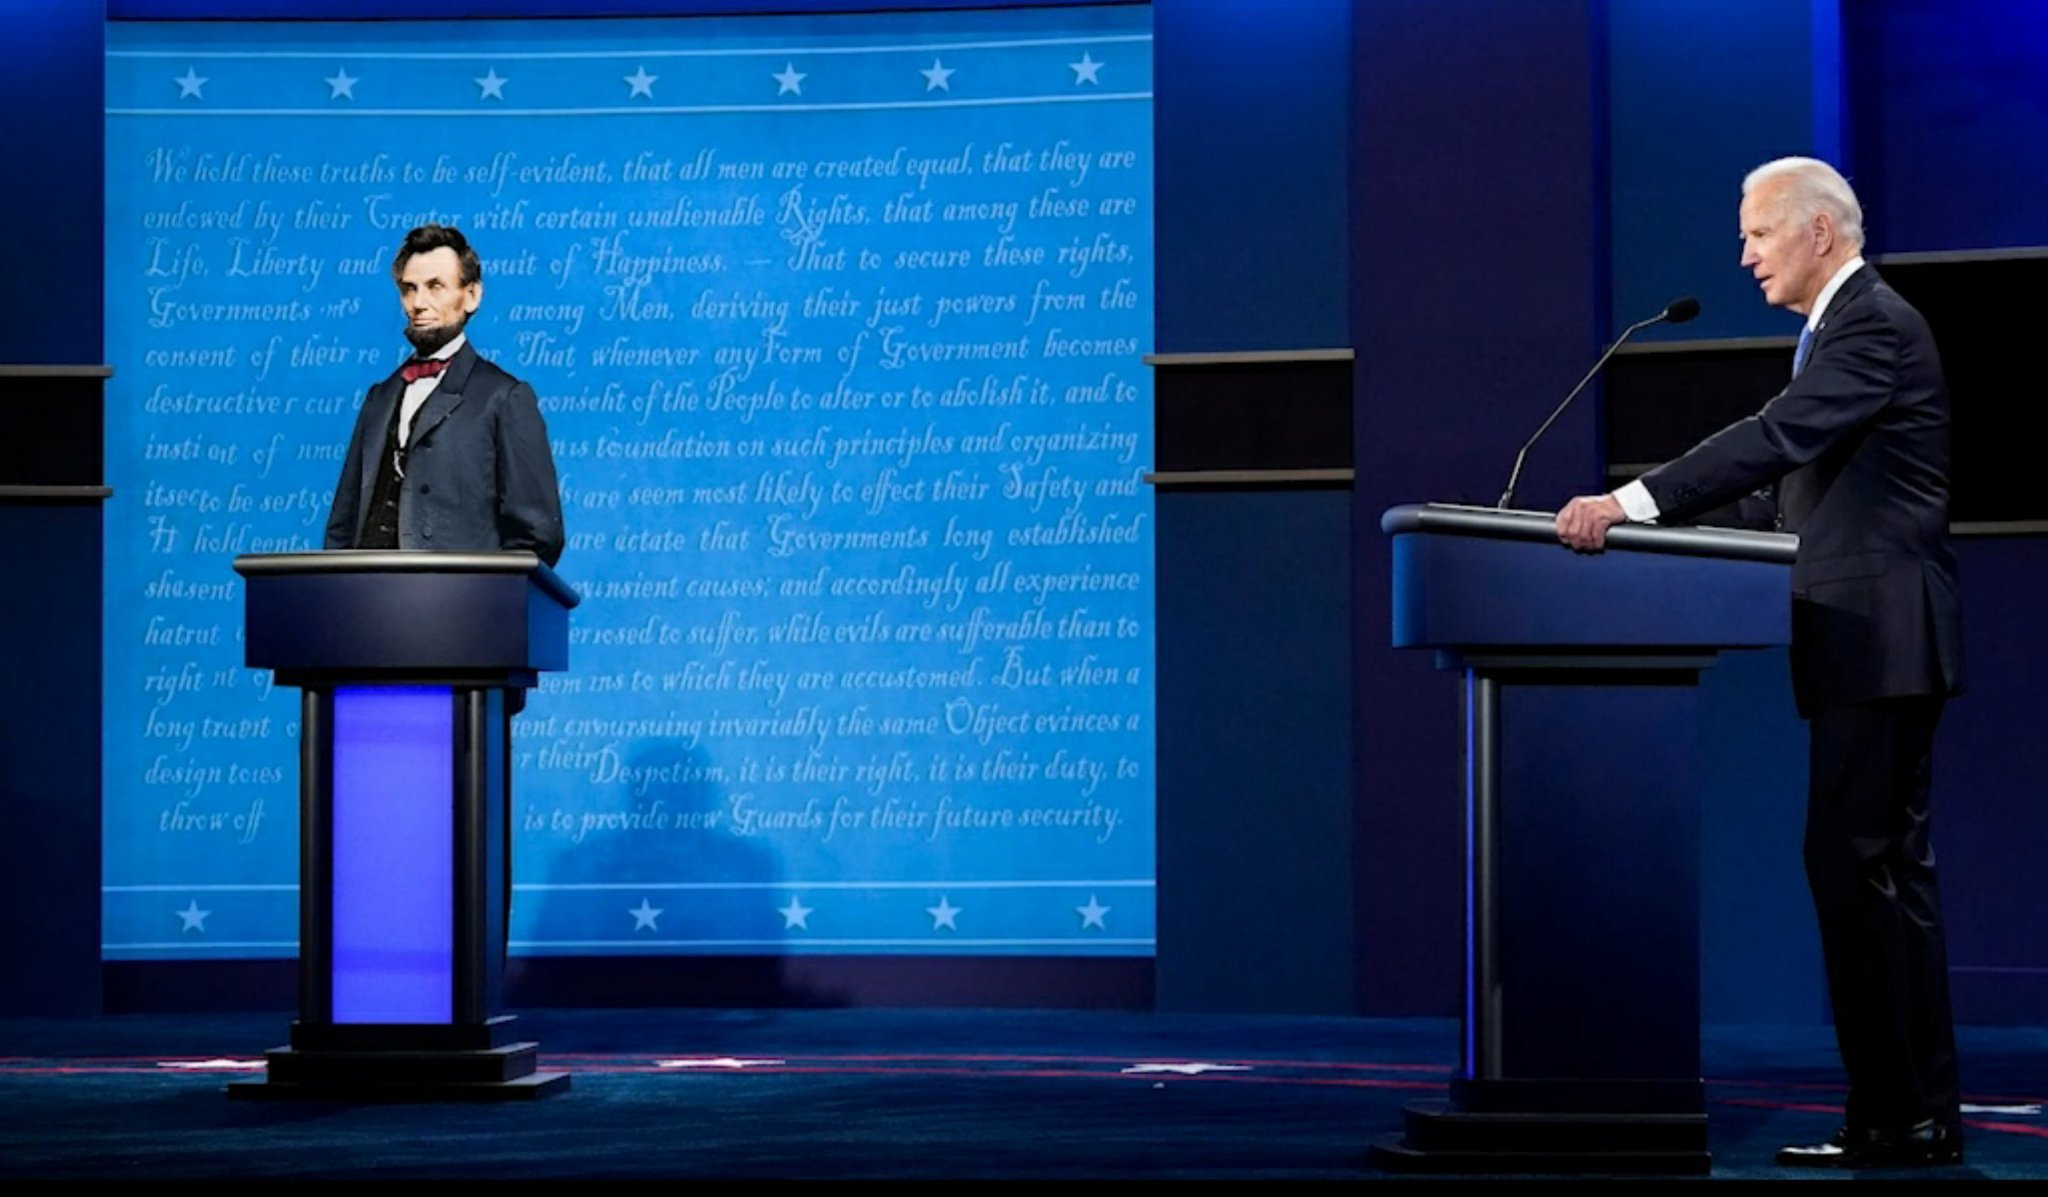 The second debate according to biden - meme